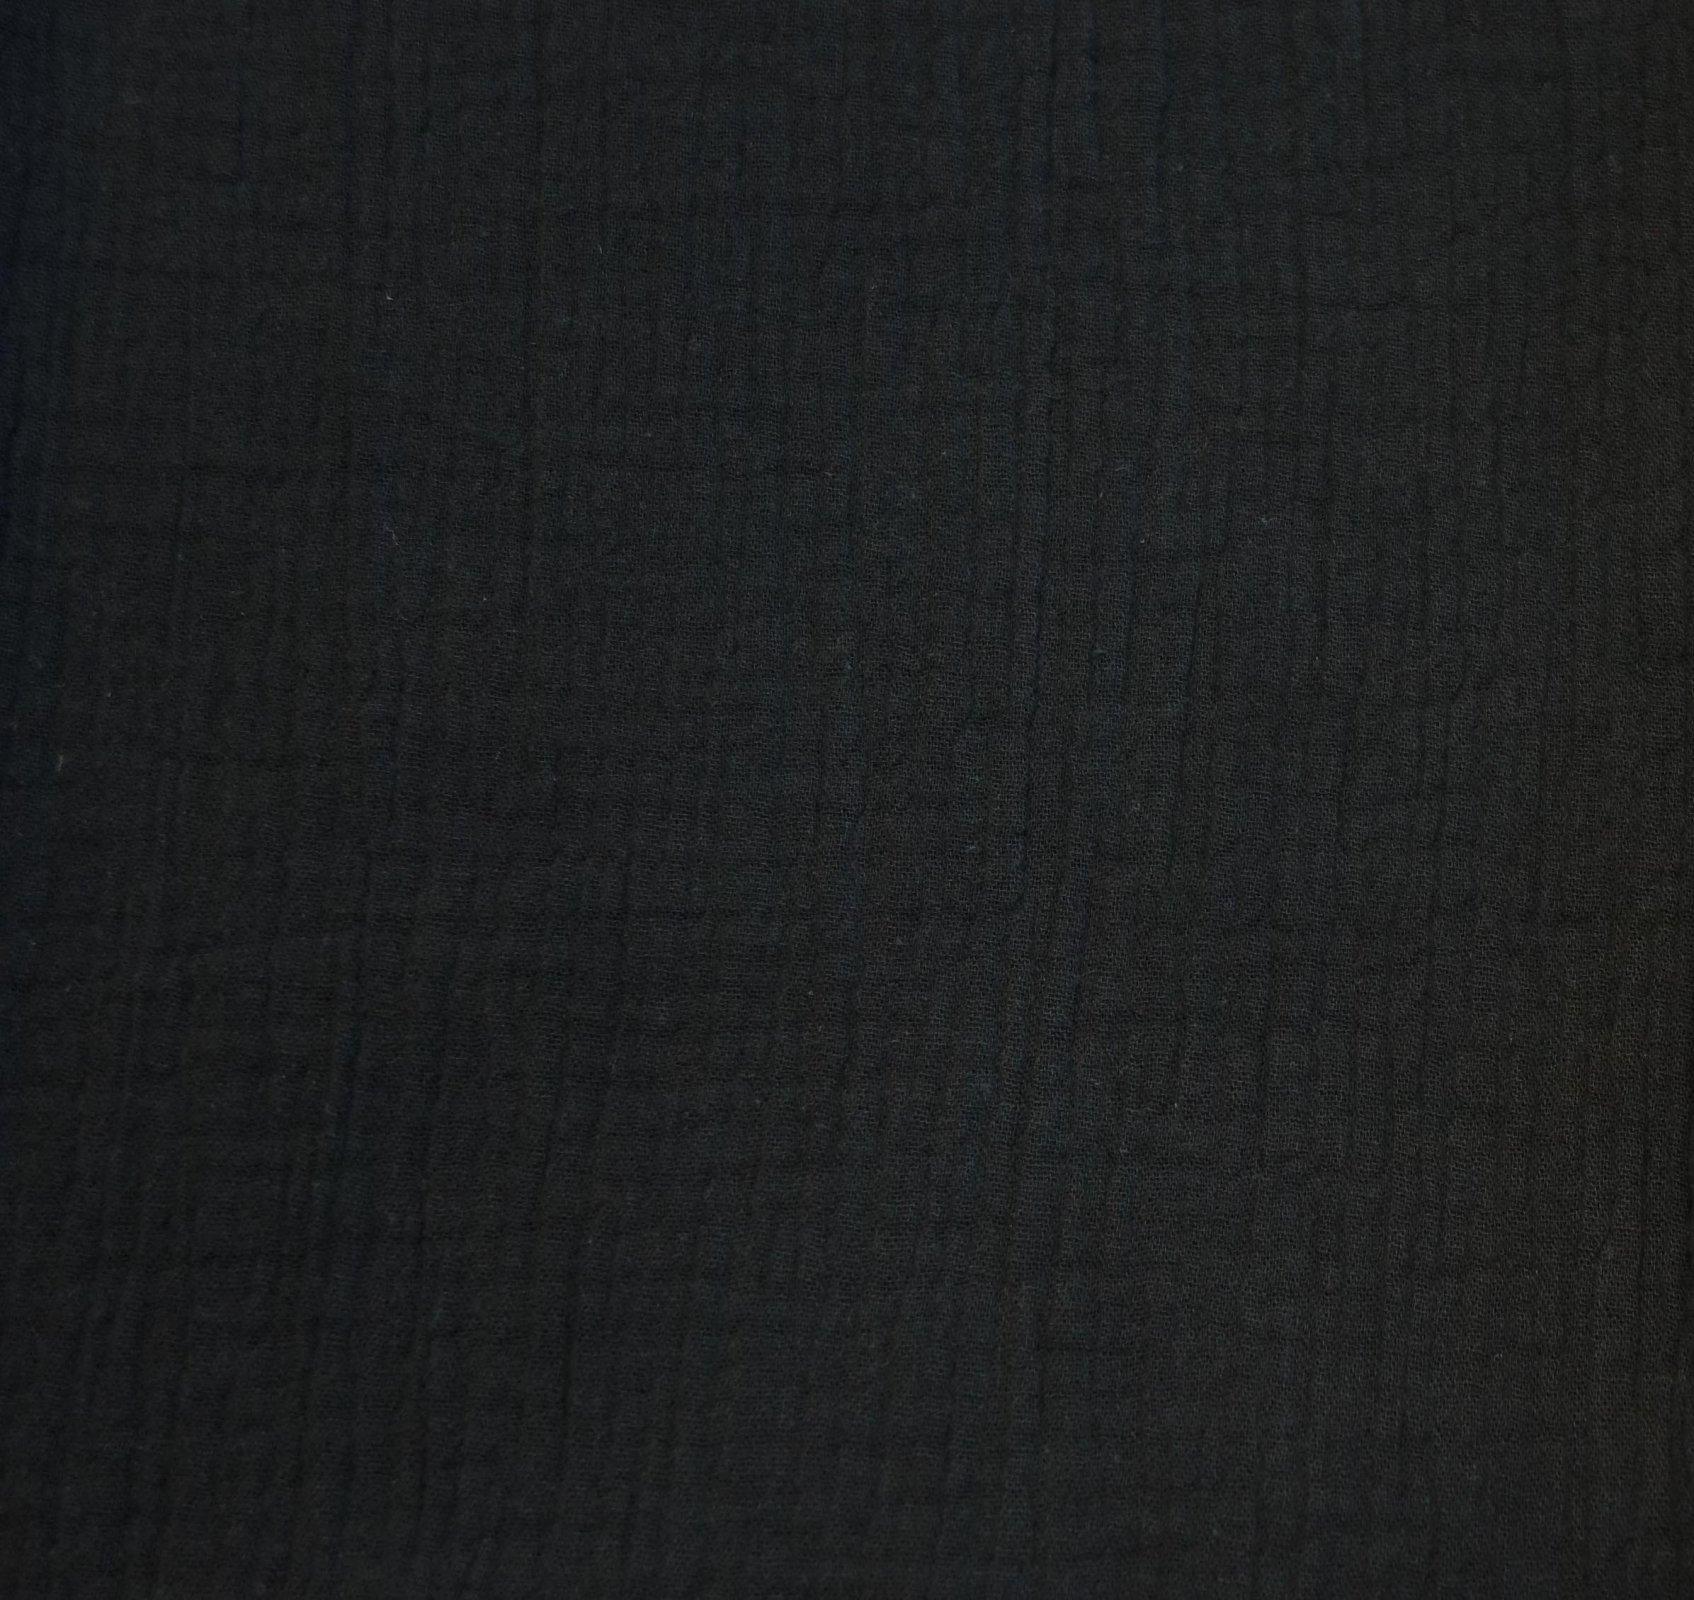 Cotton Double Gauze -  Organic Black